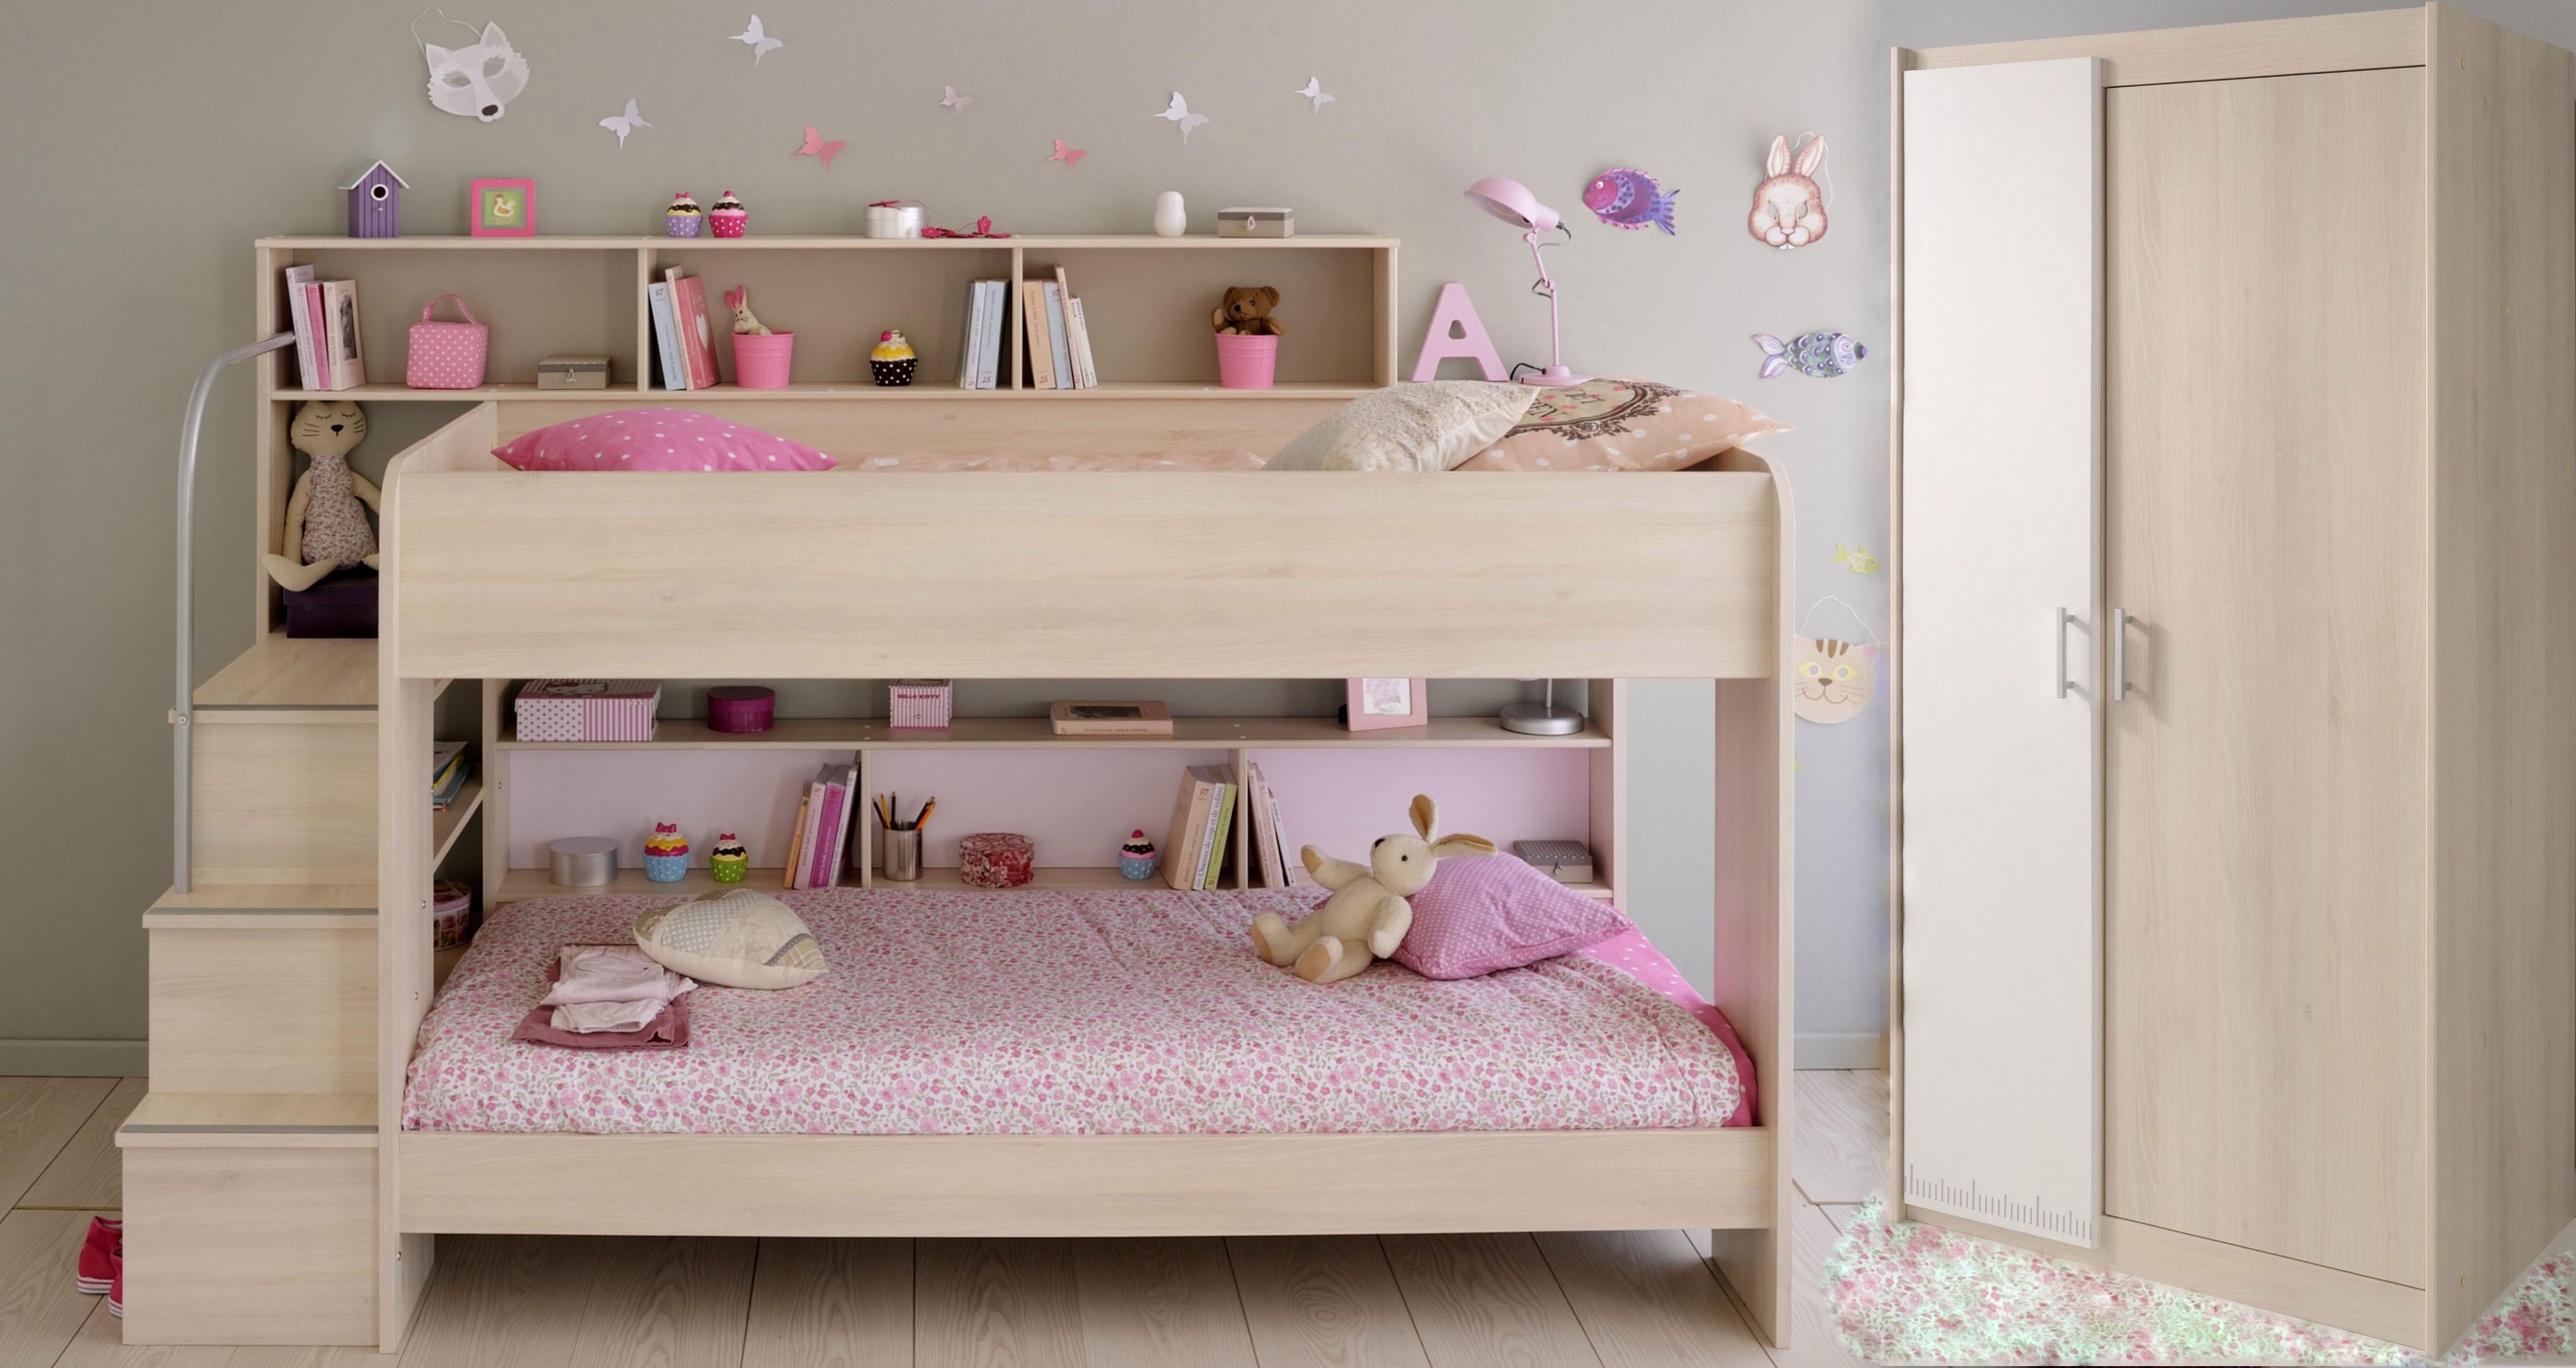 Parisot Kinderzimmer-Set Bibop (2-tlg) | Kinderzimmer > Komplett-Kinderzimmer | Braun | Parisot